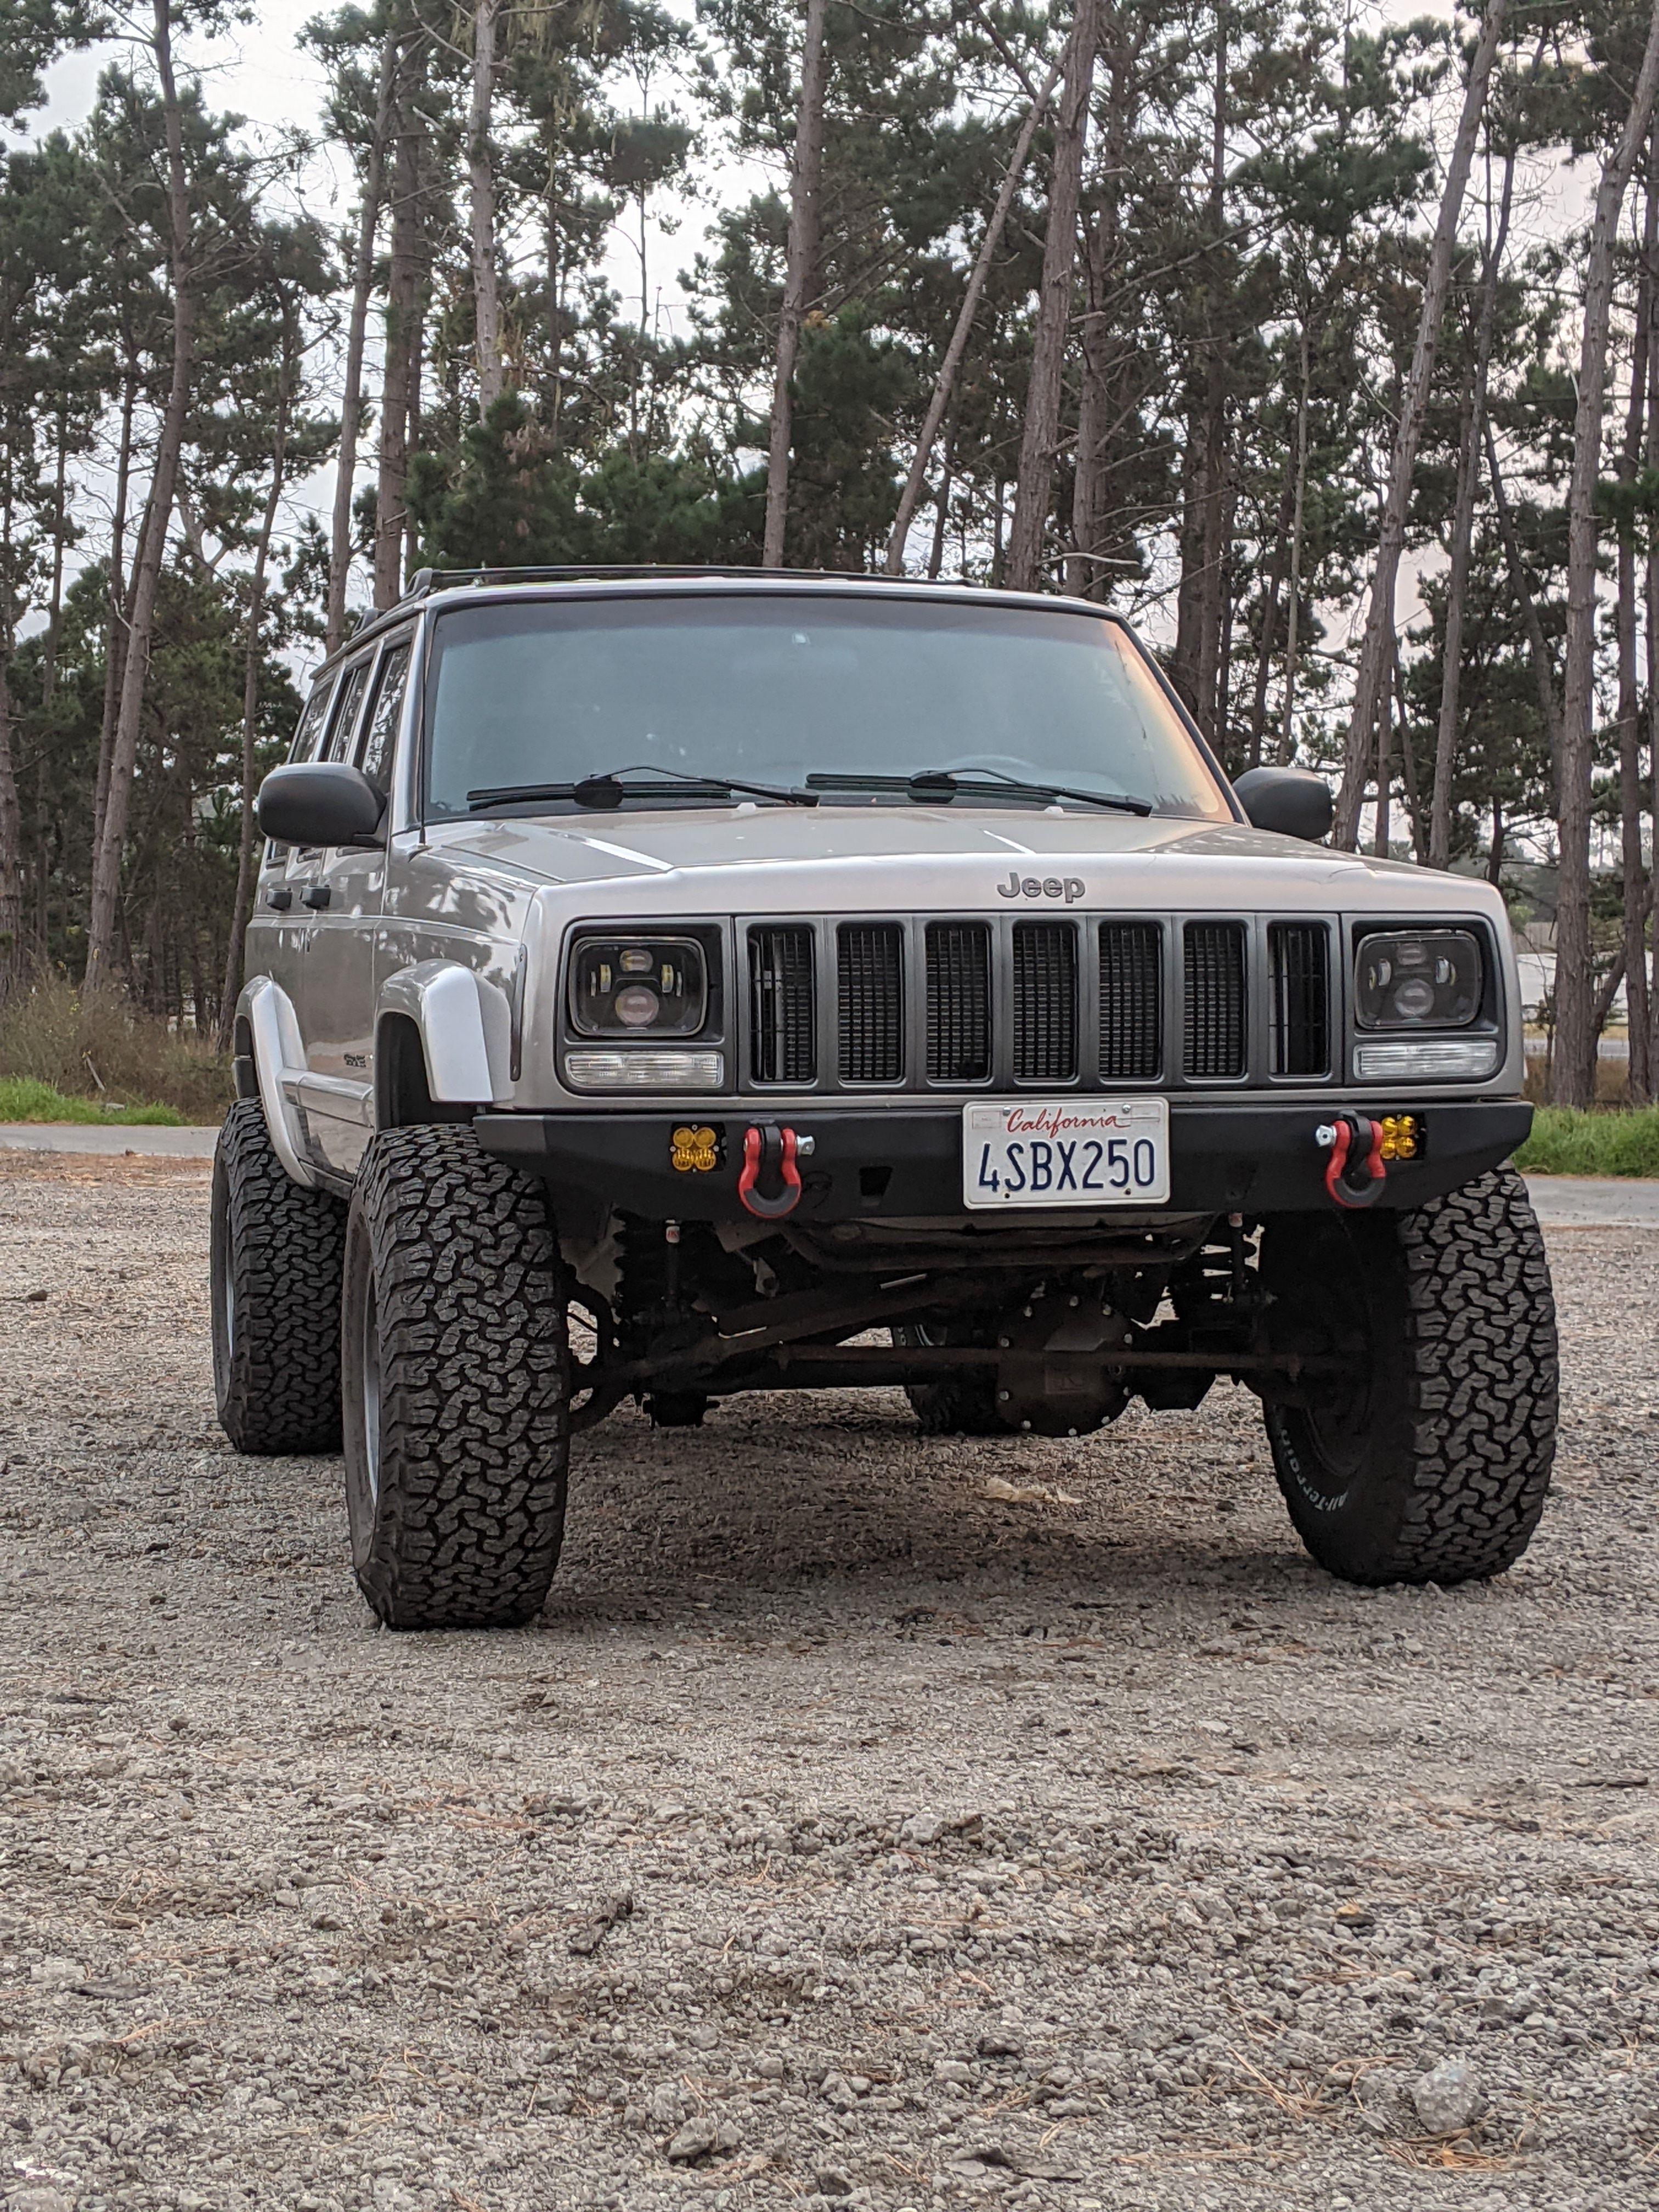 Jeep Cherokee Xj In 2021 Jeep Cherokee Xj Jeep Cherokee Bumpers Jeep Cherokee